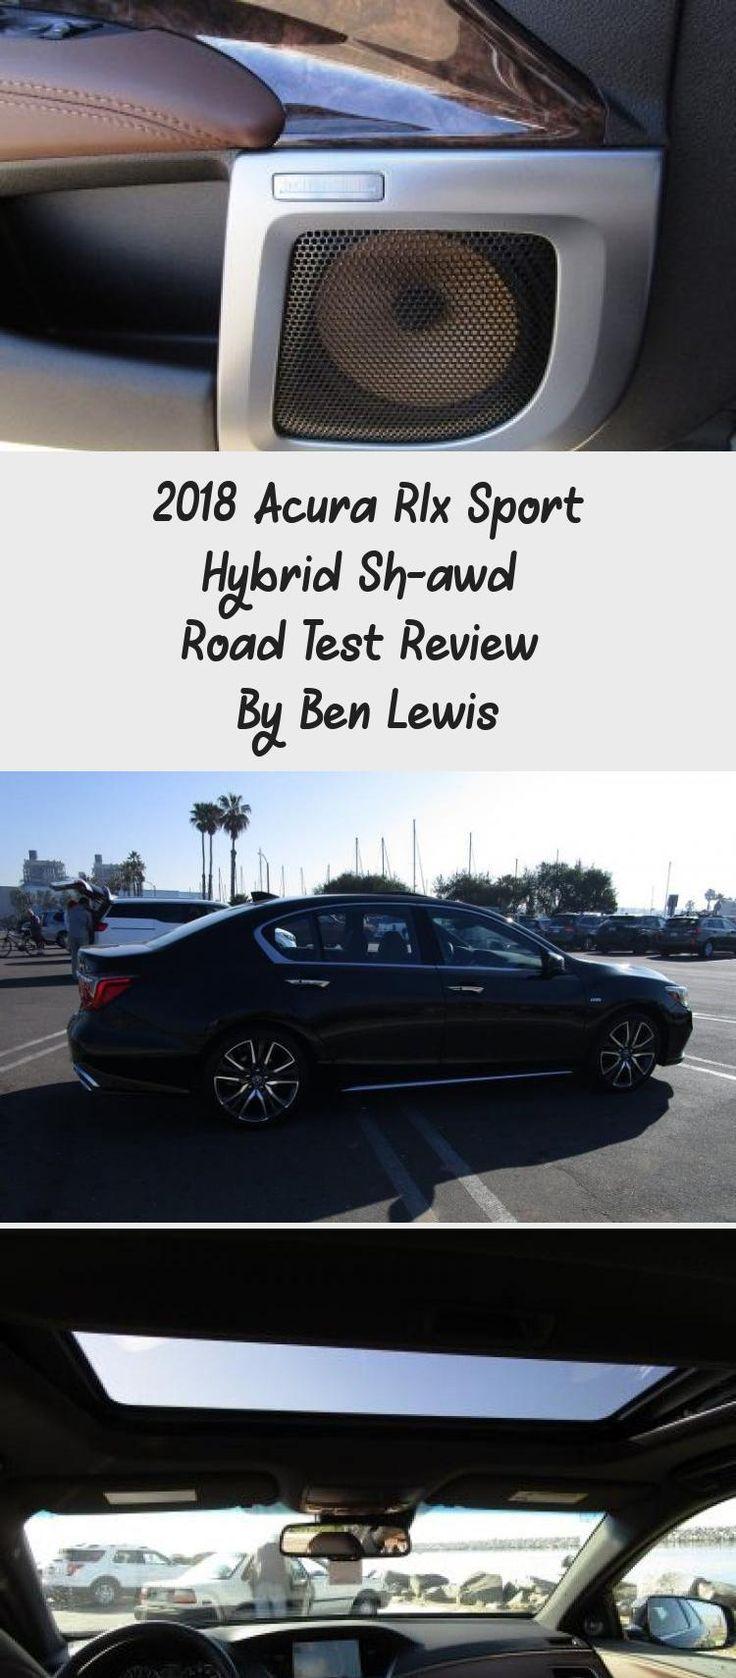 2018 Acura Rlx Sport Hybrid Sh Awd Road Test Review By Ben Lewis Car Shopping Acurasteeringwheel Acuralegend Acuraemblem Acuradep In 2020 Acura Road Test Awd